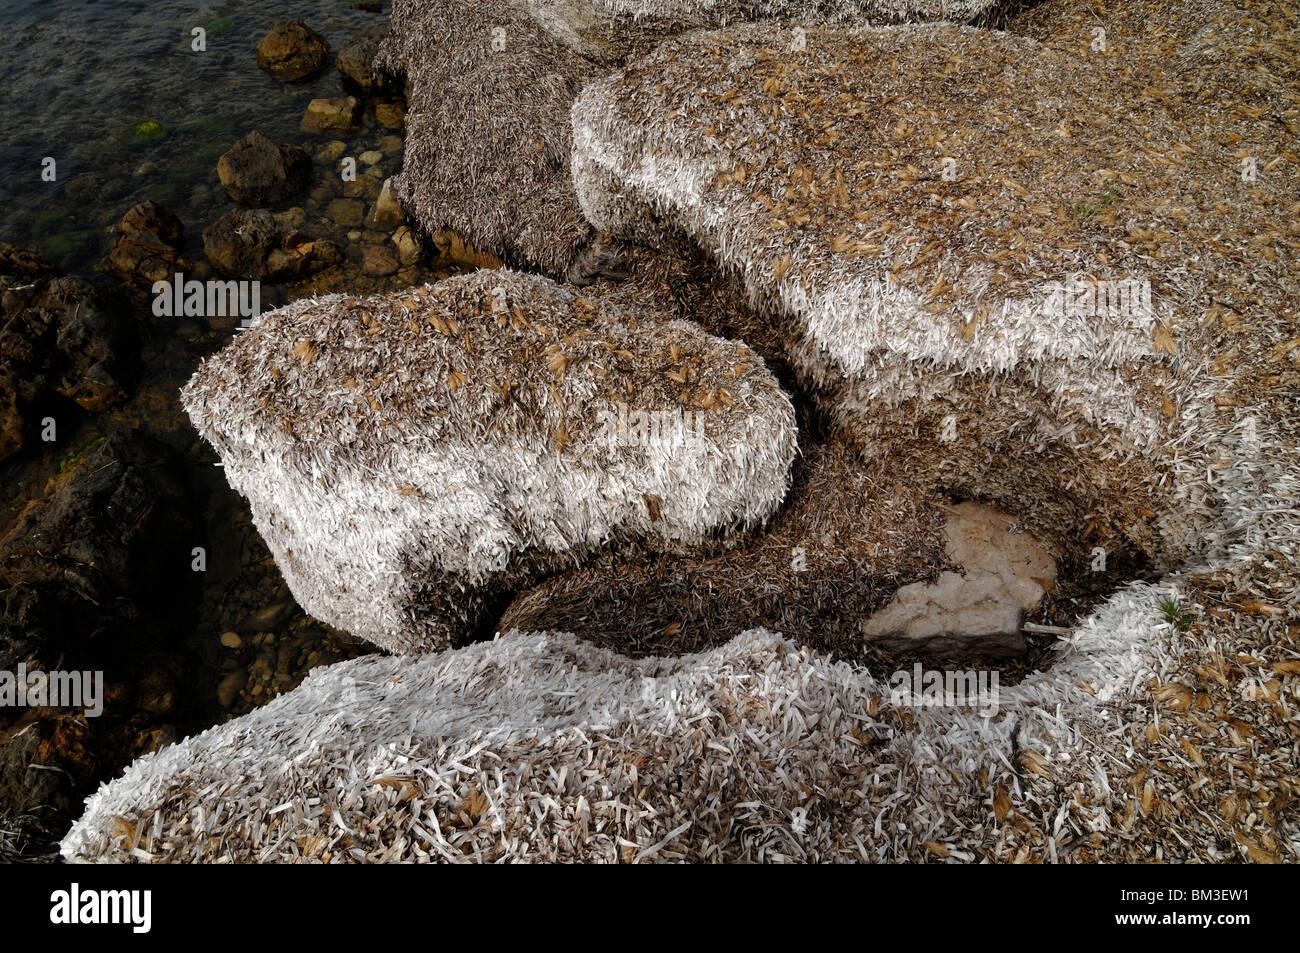 Bed of Dried Seagrass Île Saint Honorat, or Saint Honorat Island, Mediterranean Coast or Shoreline, Côte - Stock Image